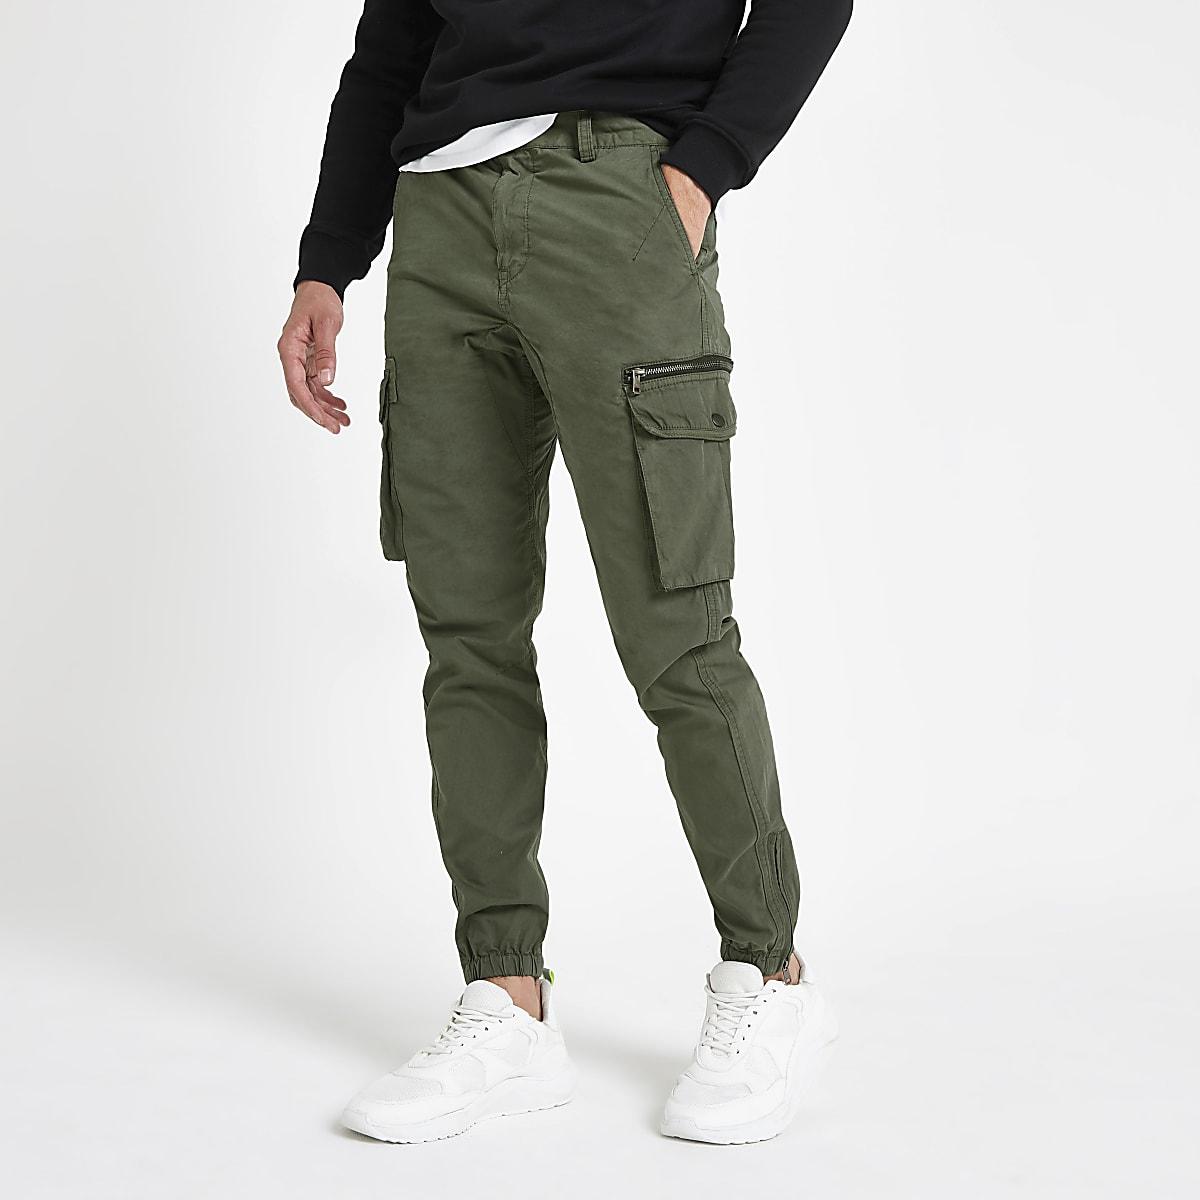 Khaki slim fit cargo pants